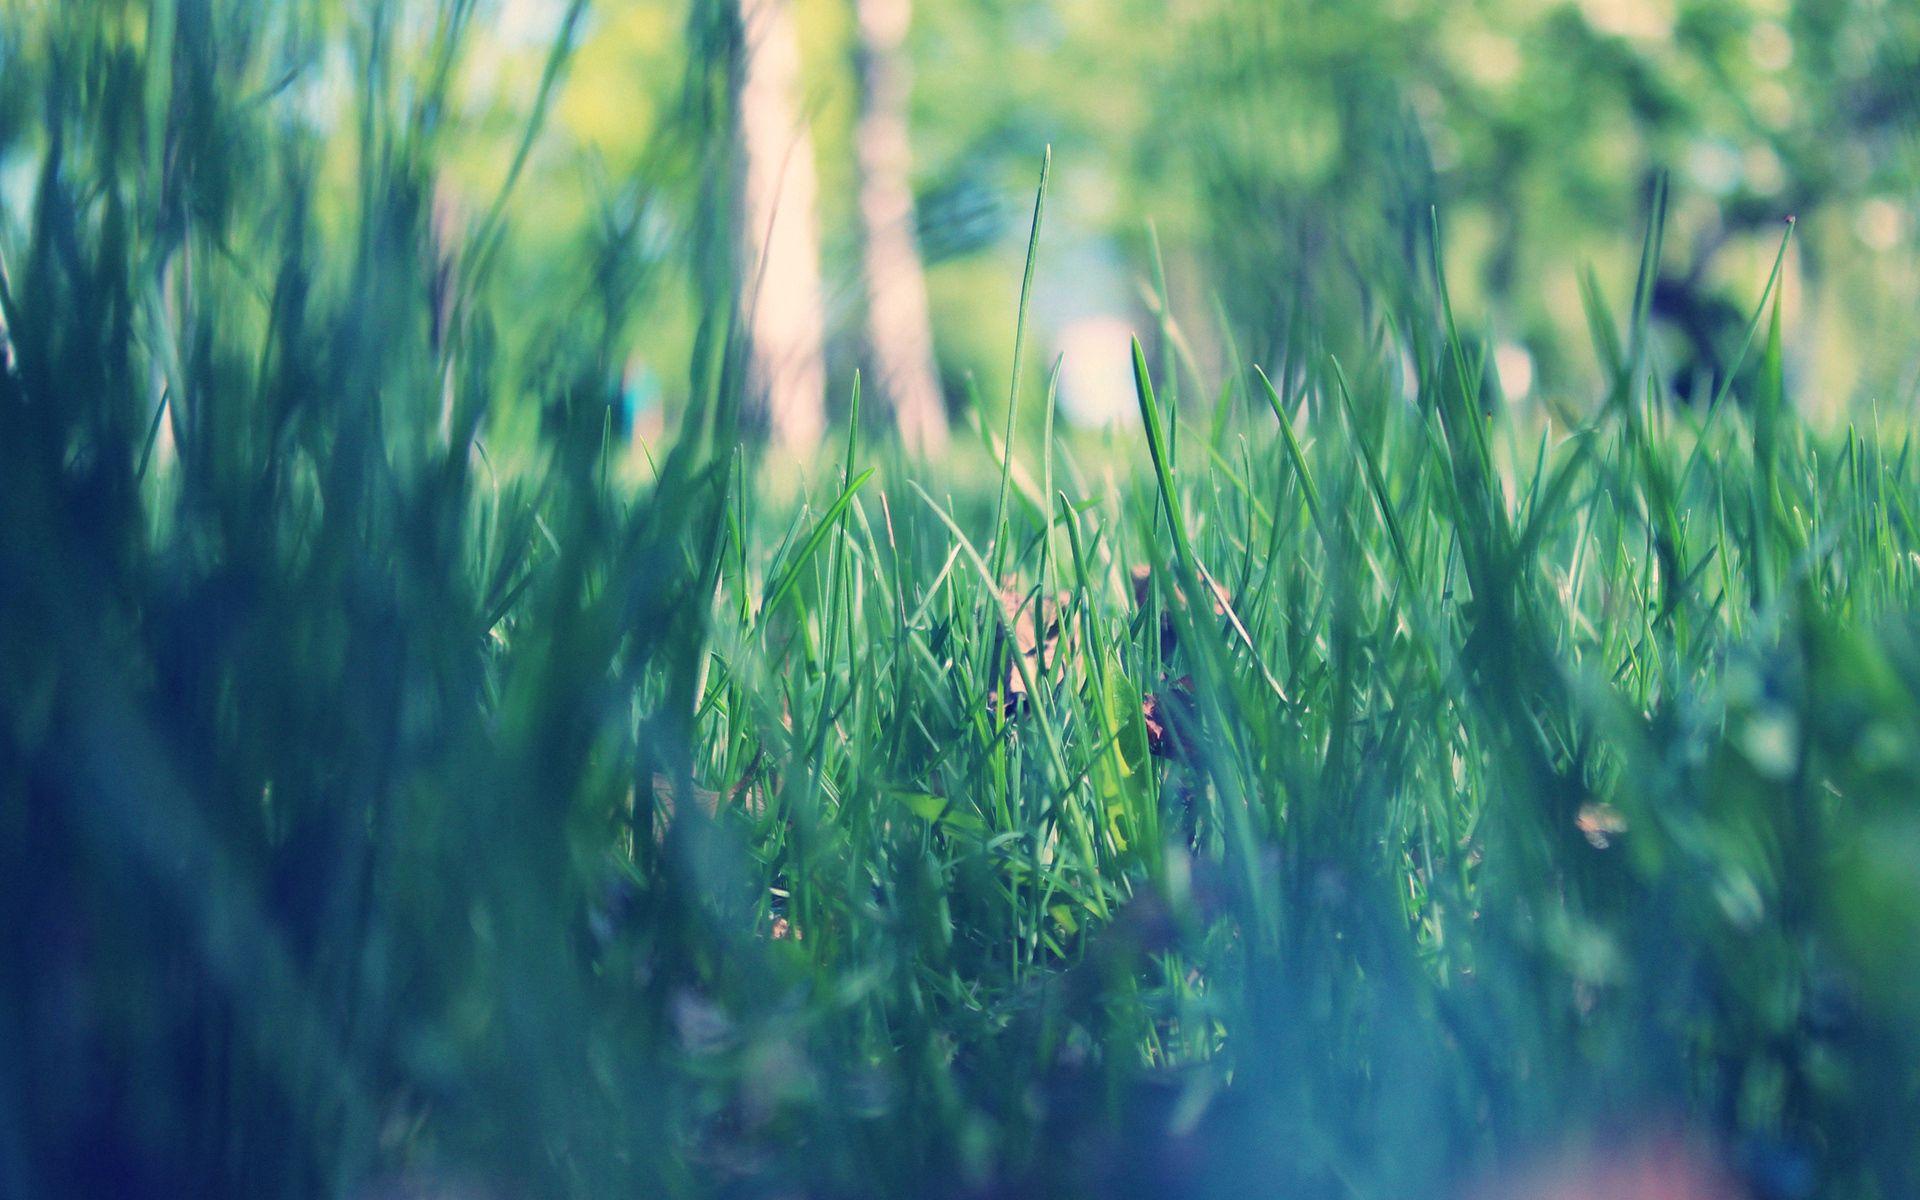 107403 Заставки и Обои Трава на телефон. Скачать Макро, Парк, Утро, Весна, Трава, Зеленая картинки бесплатно